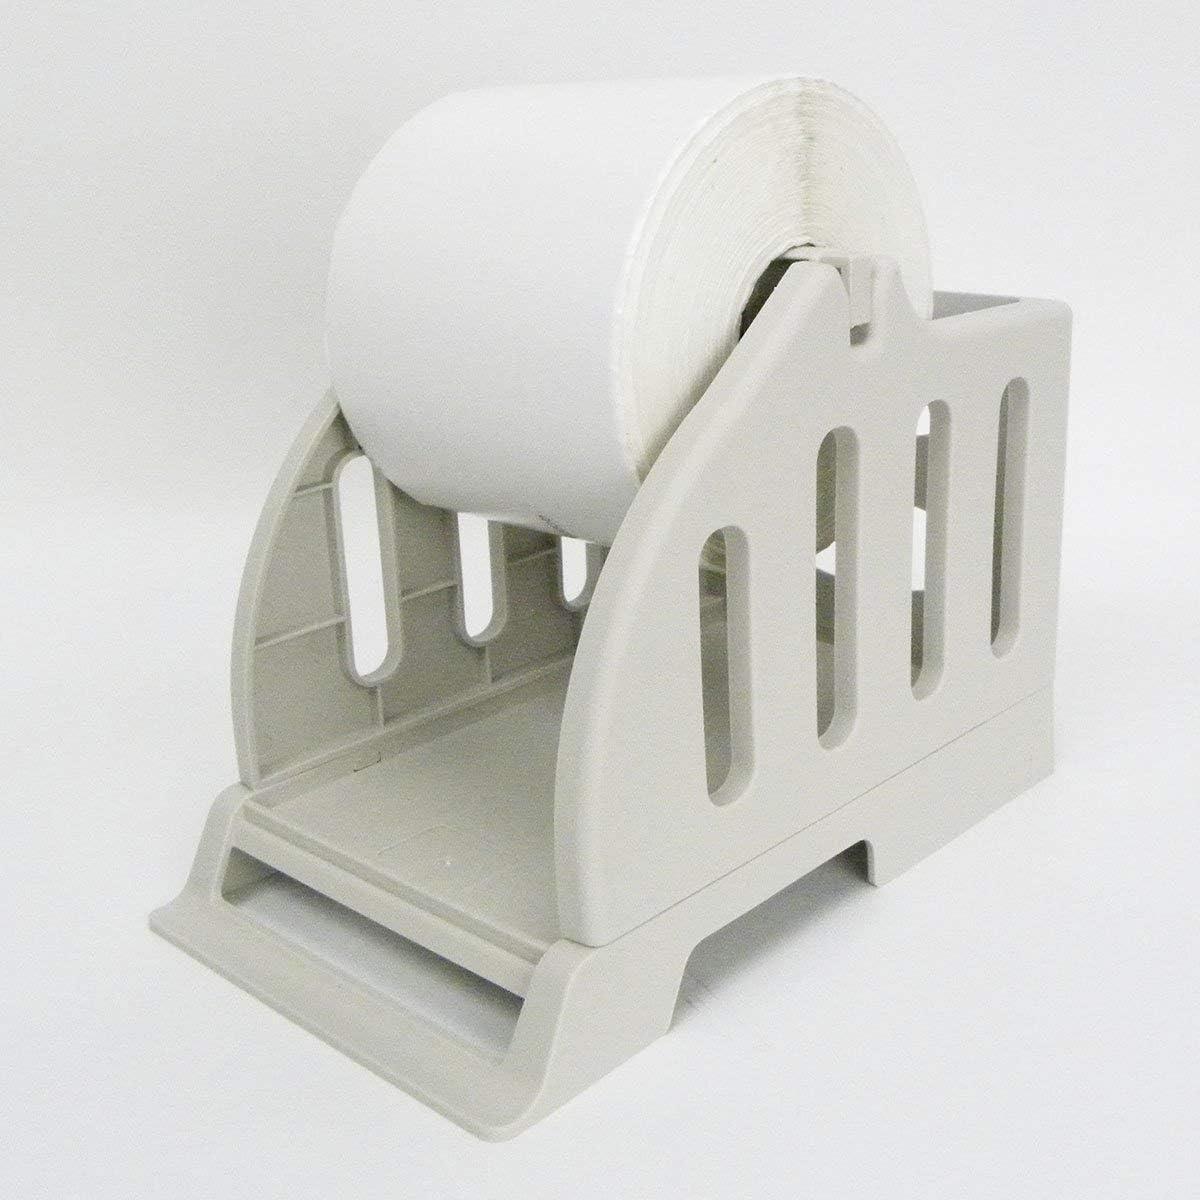 EEkiimy External Plastic Roll Label Paper Holder for Desktop Thermal Barcode Printer Label Paper Holder Thermal Sticker Label Printer for Delivery, Supermarket, Pharmacy Store (Roll Paper Holder)